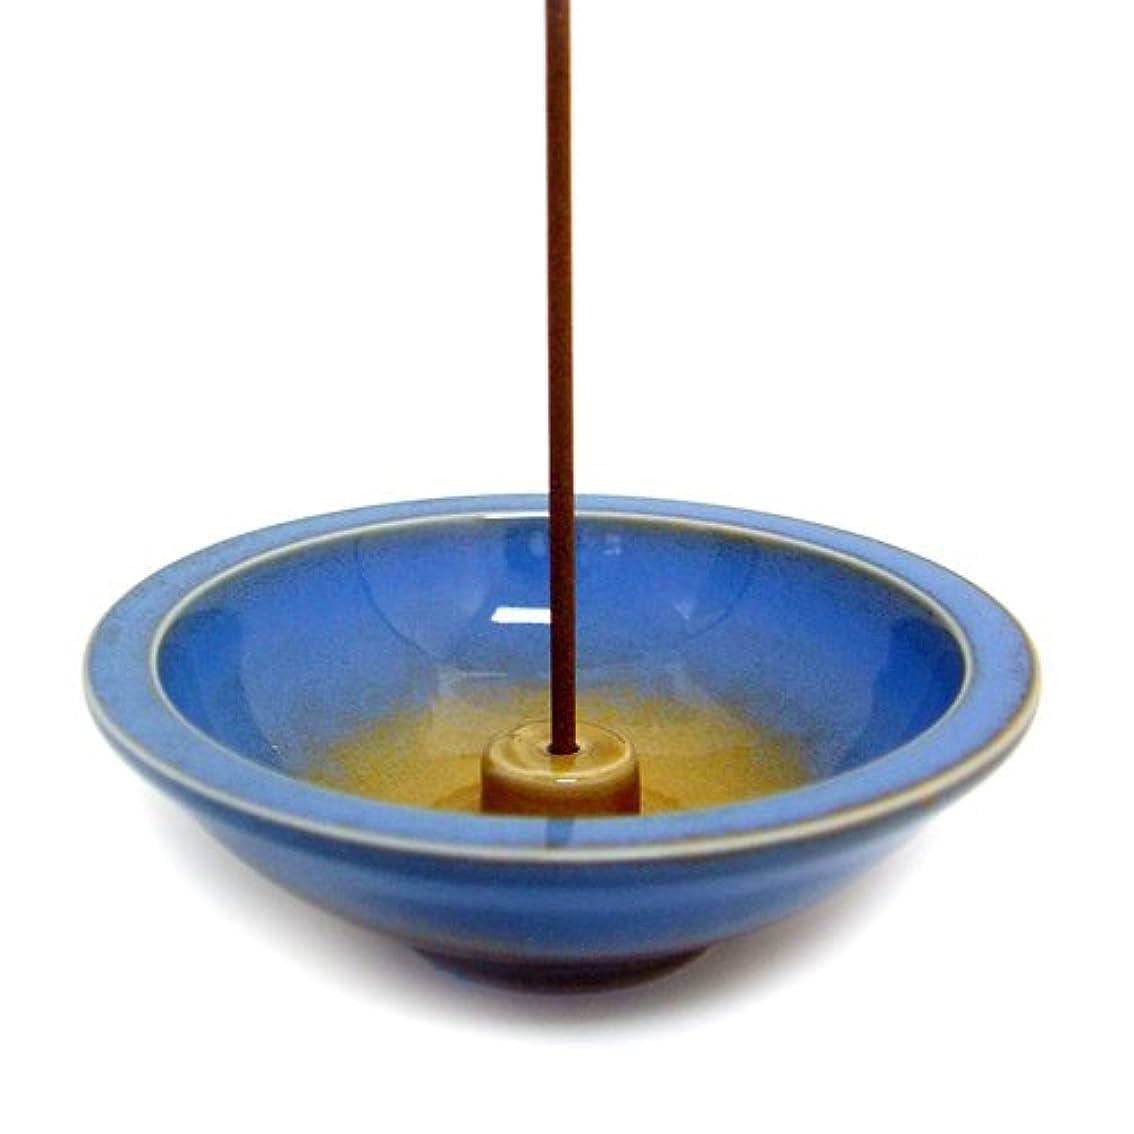 Shoyeido's Azure Round Ceramic Incense Holder by SHOYEIDO